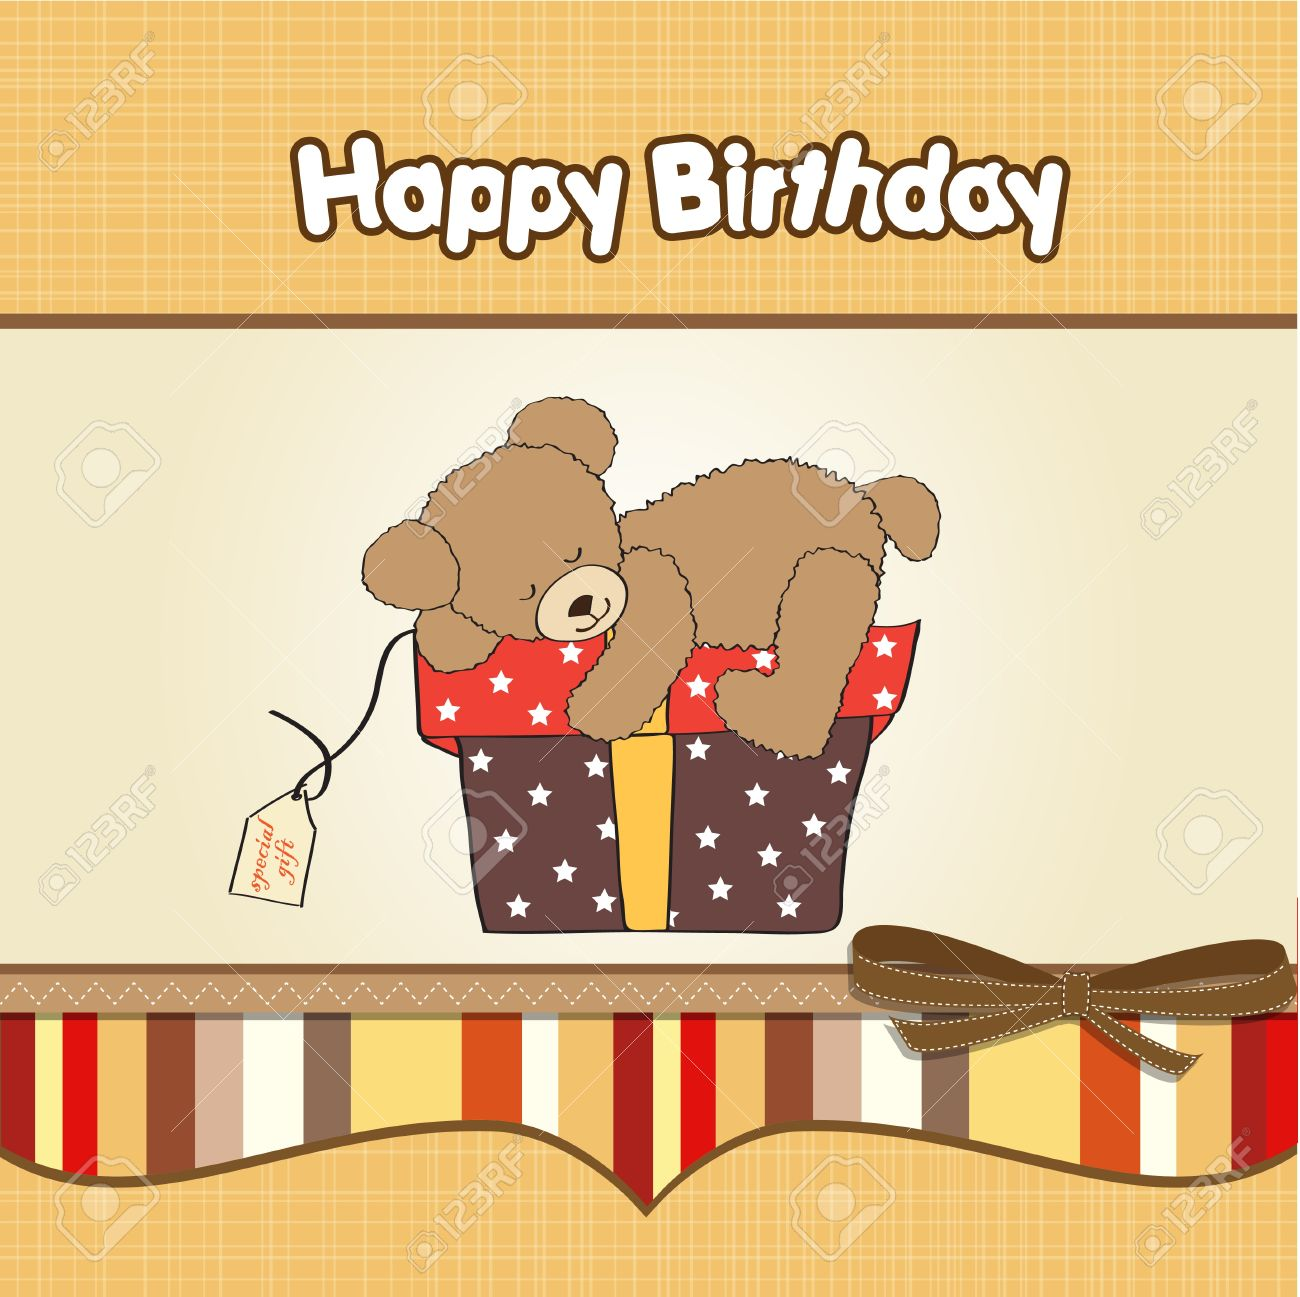 Birthday Greeting Card With Teddy Bear And Big Gift Box Royalty Free